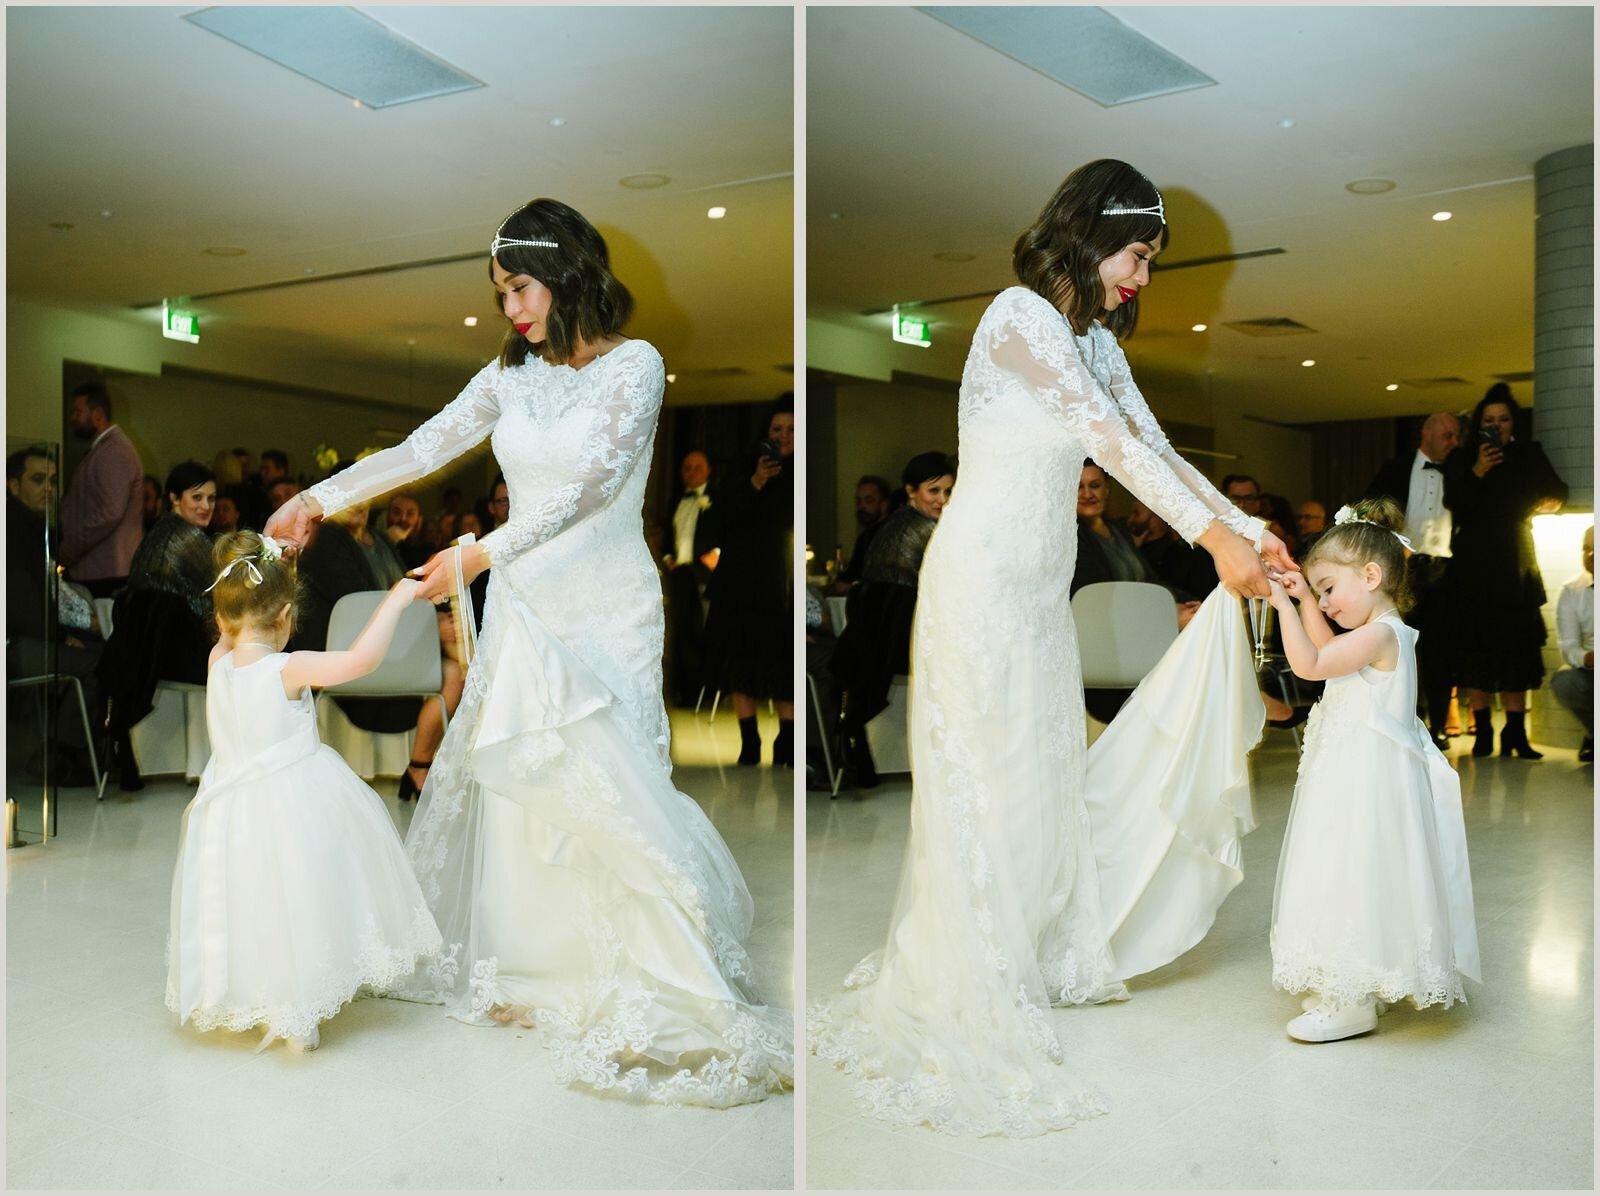 joseph_koprek_wedding_melbourne_the_prince_deck_0096.jpg